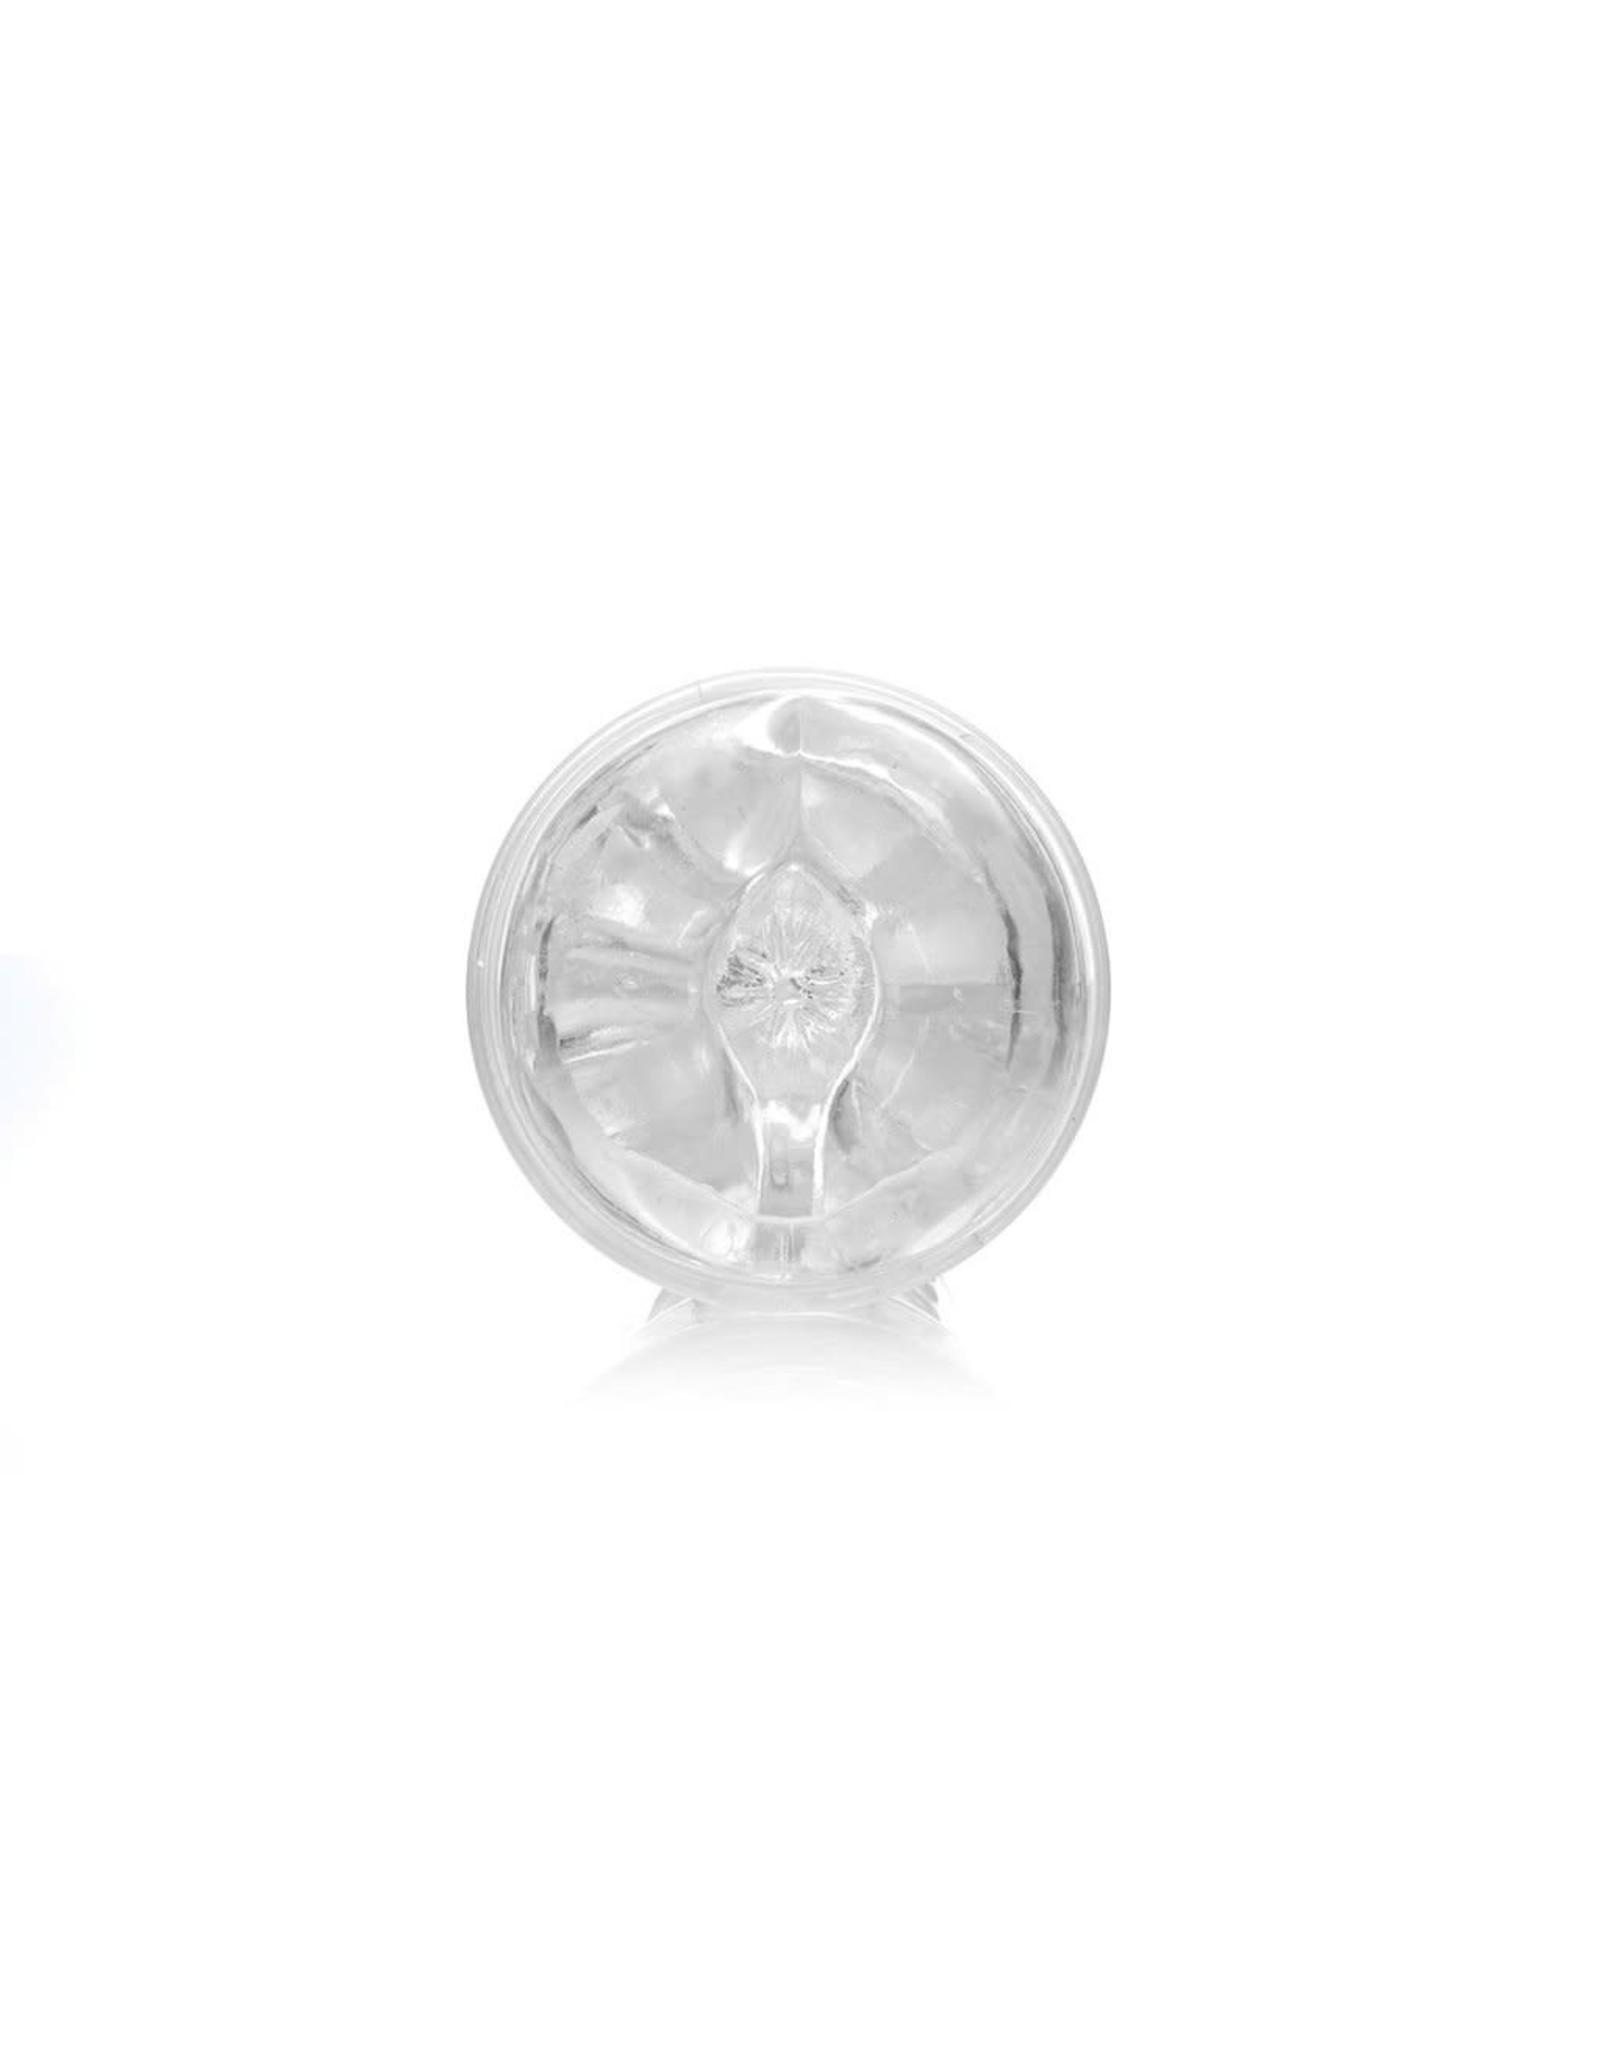 FLESH-LIGHT FLESHLIGHT - ICE BUTT CRYSTAL